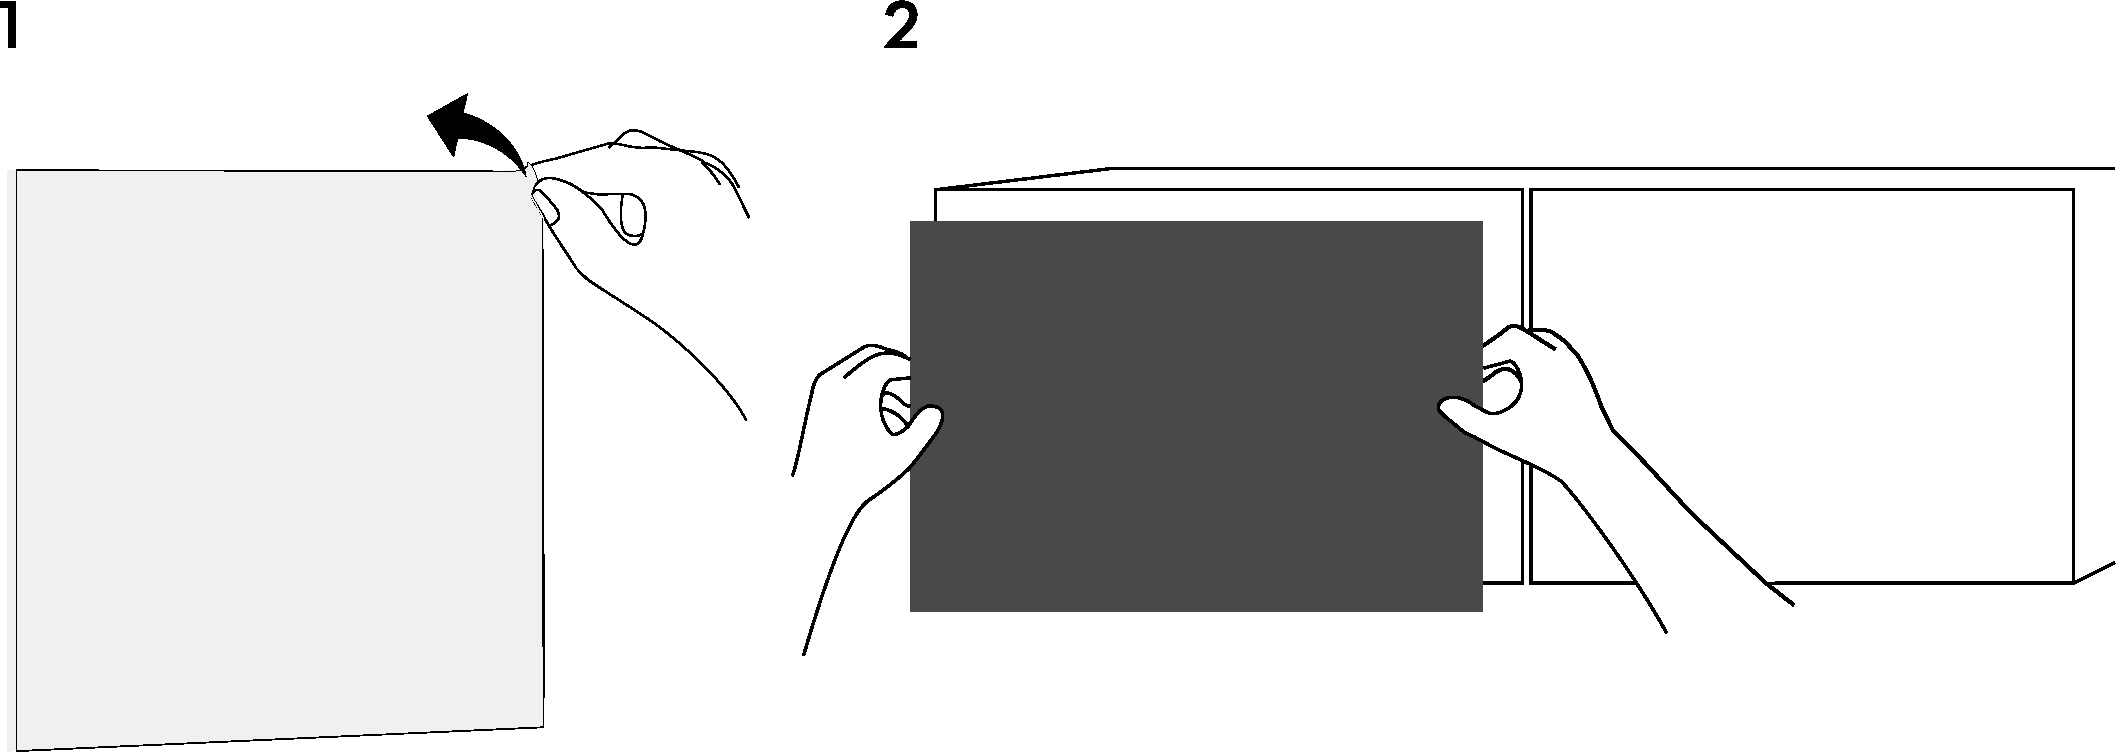 schita montaj aplicare fronturi personalizate ikea